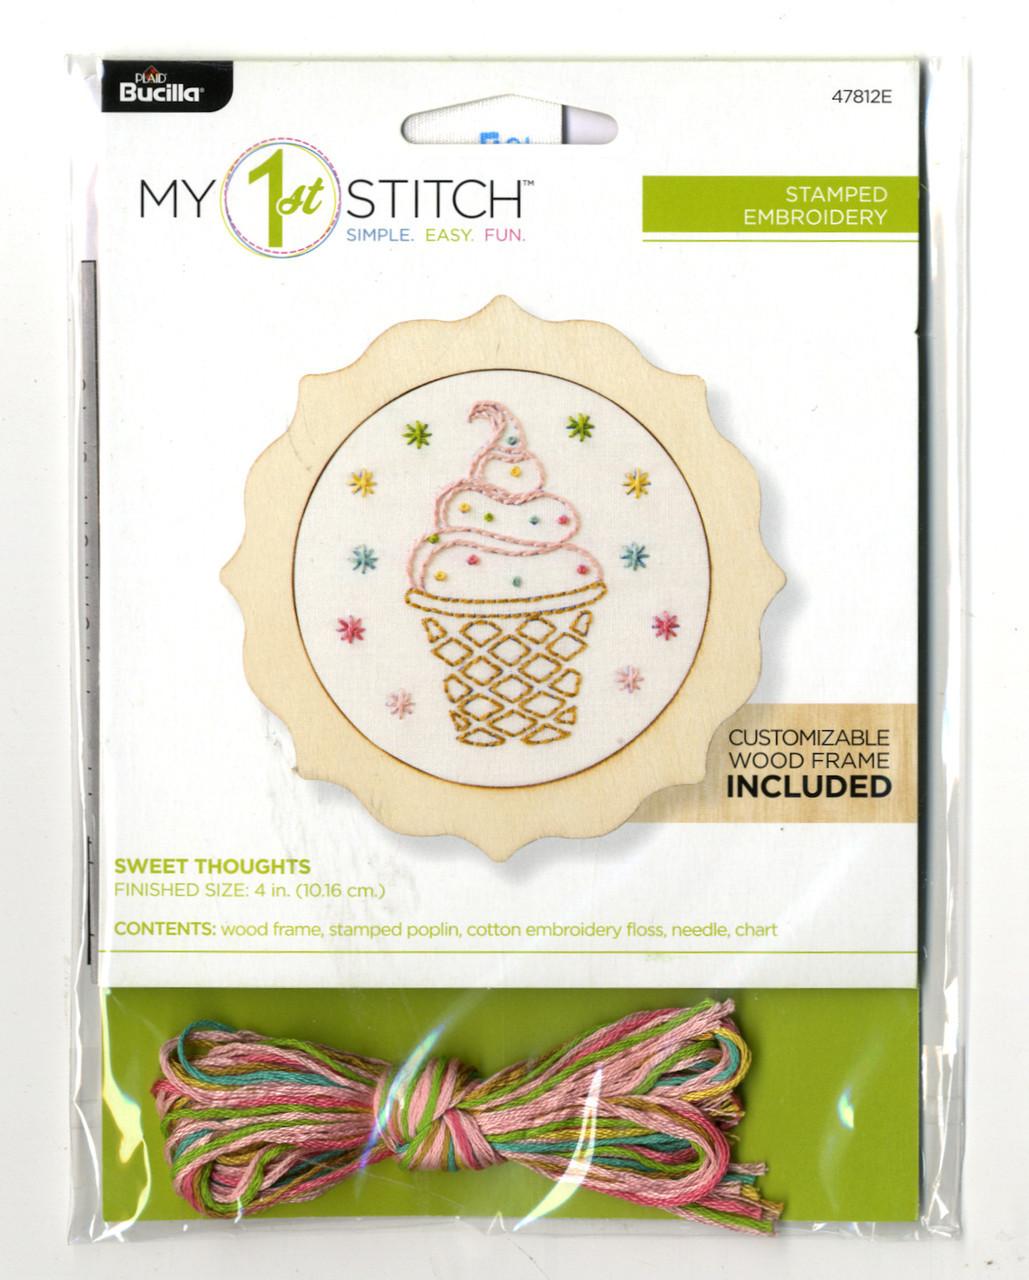 My 1st Stitch - Sweet Thoughts